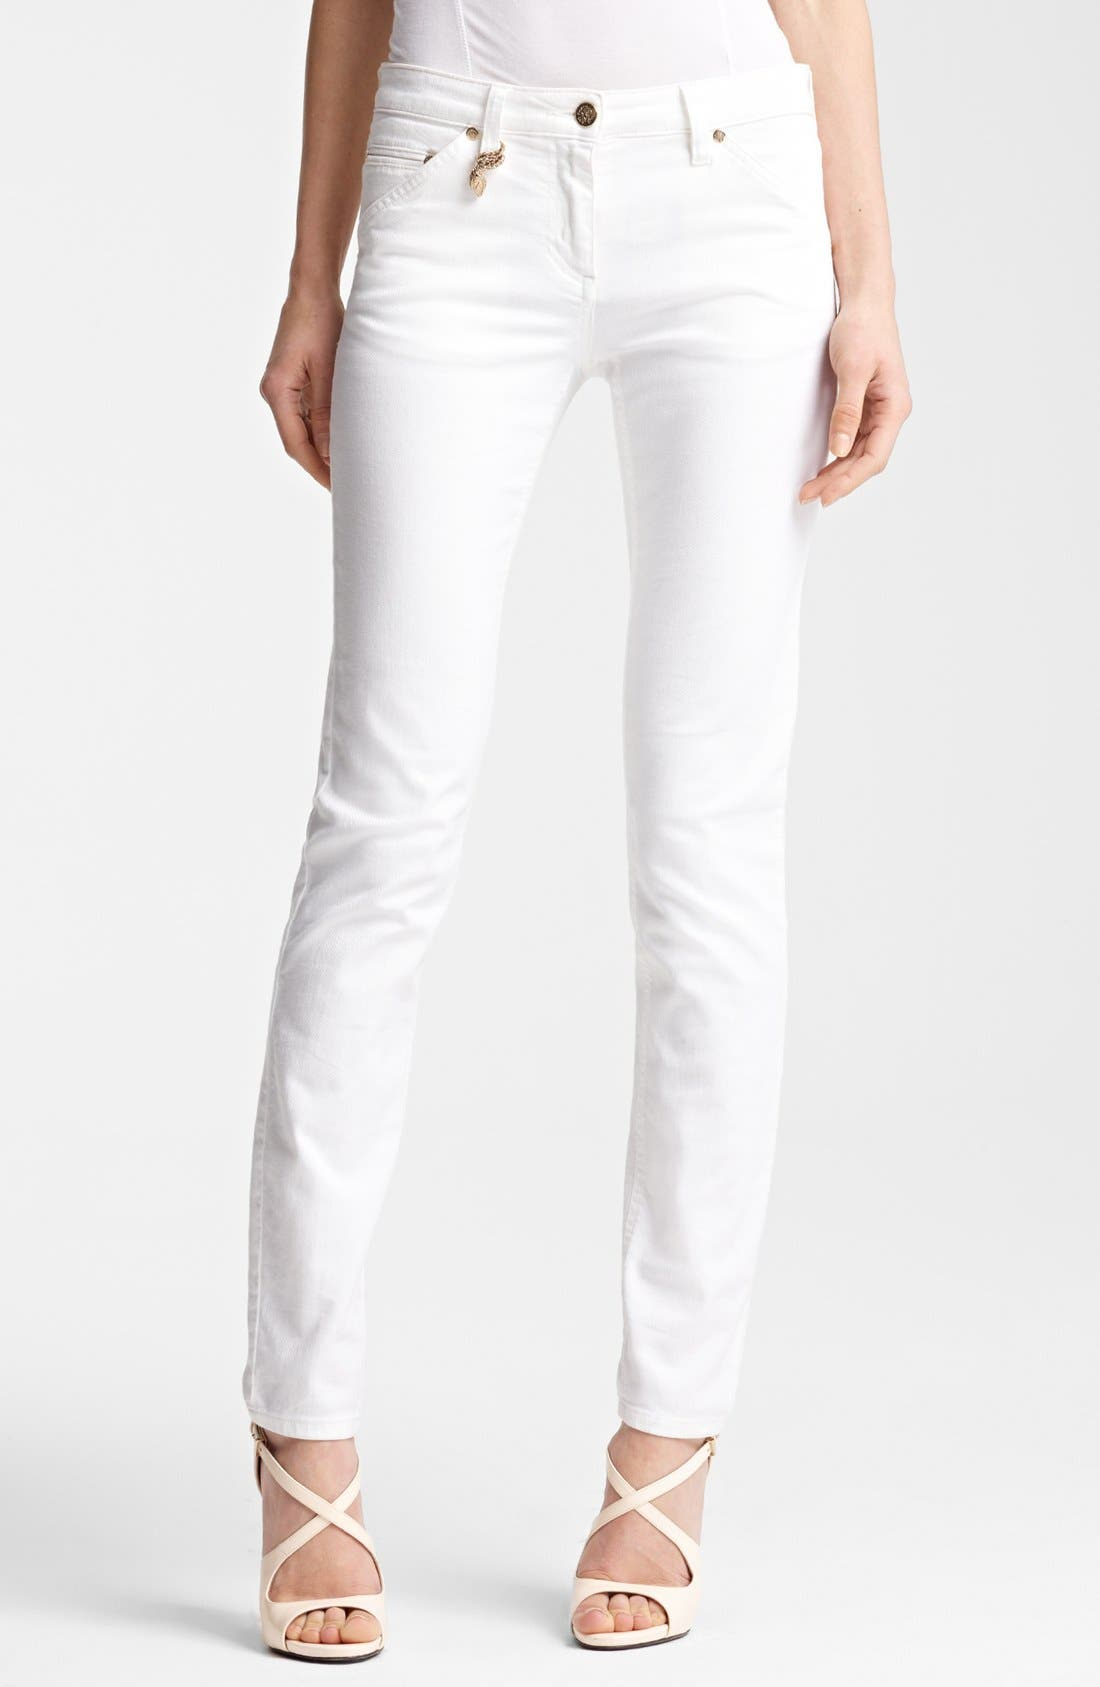 Alternate Image 1 Selected - Roberto Cavalli Skinny Stretch Jeans